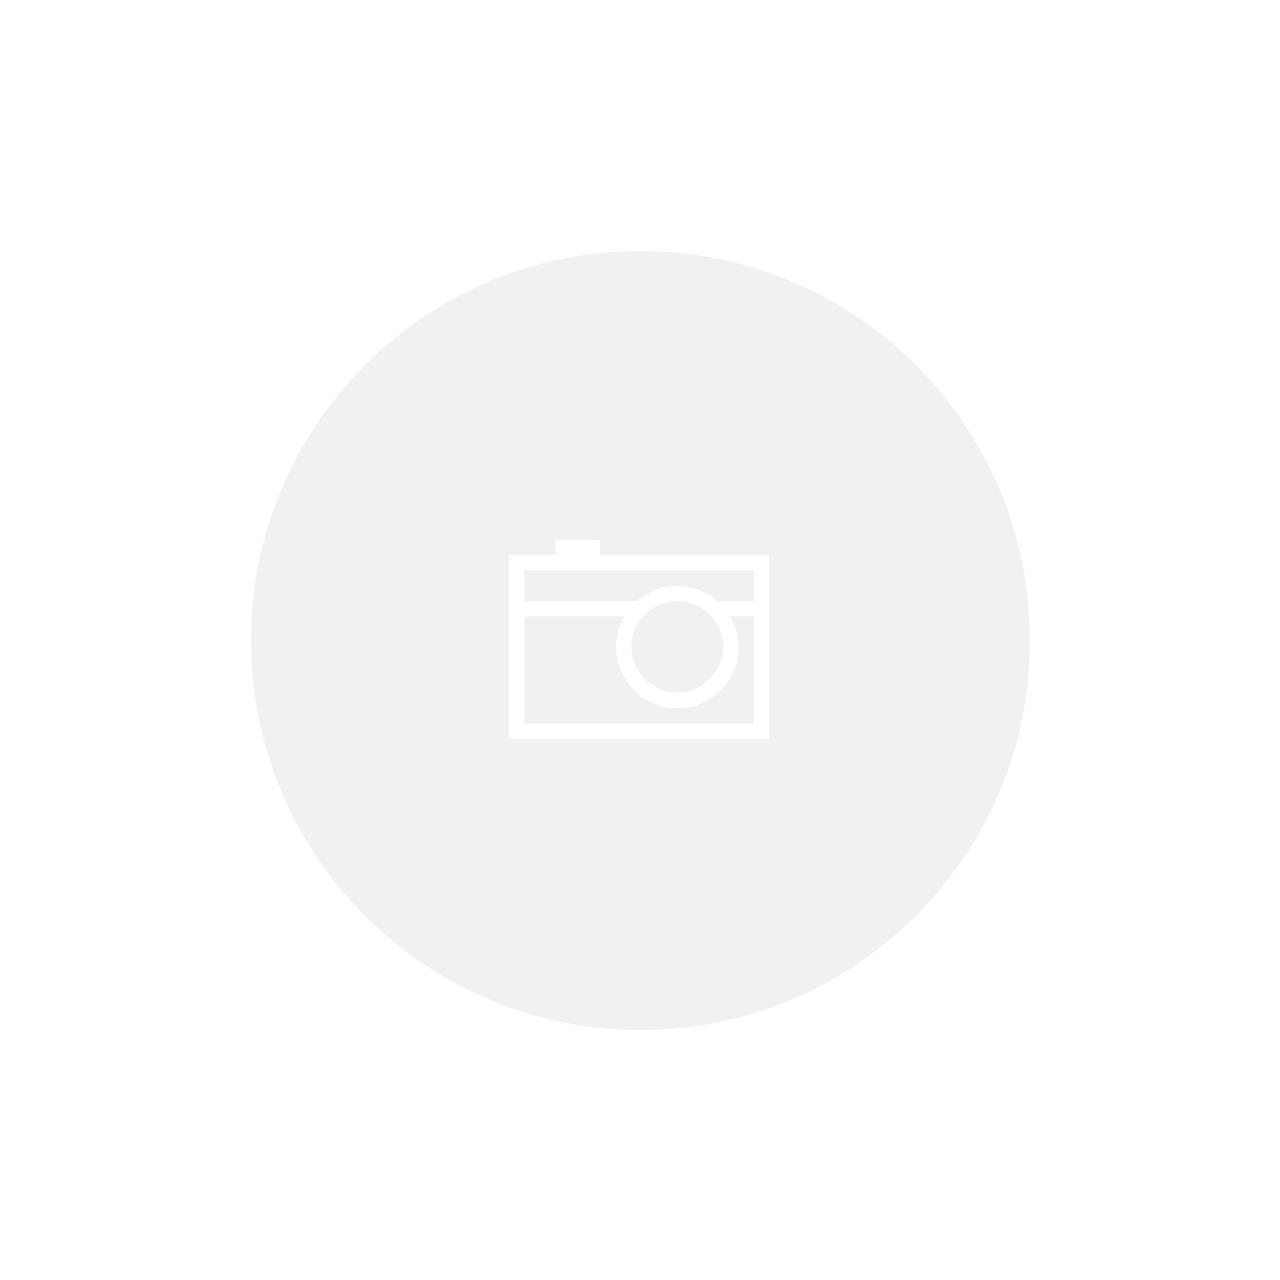 Vestido Ombro a Ombro Tricô Tranças | Vi026